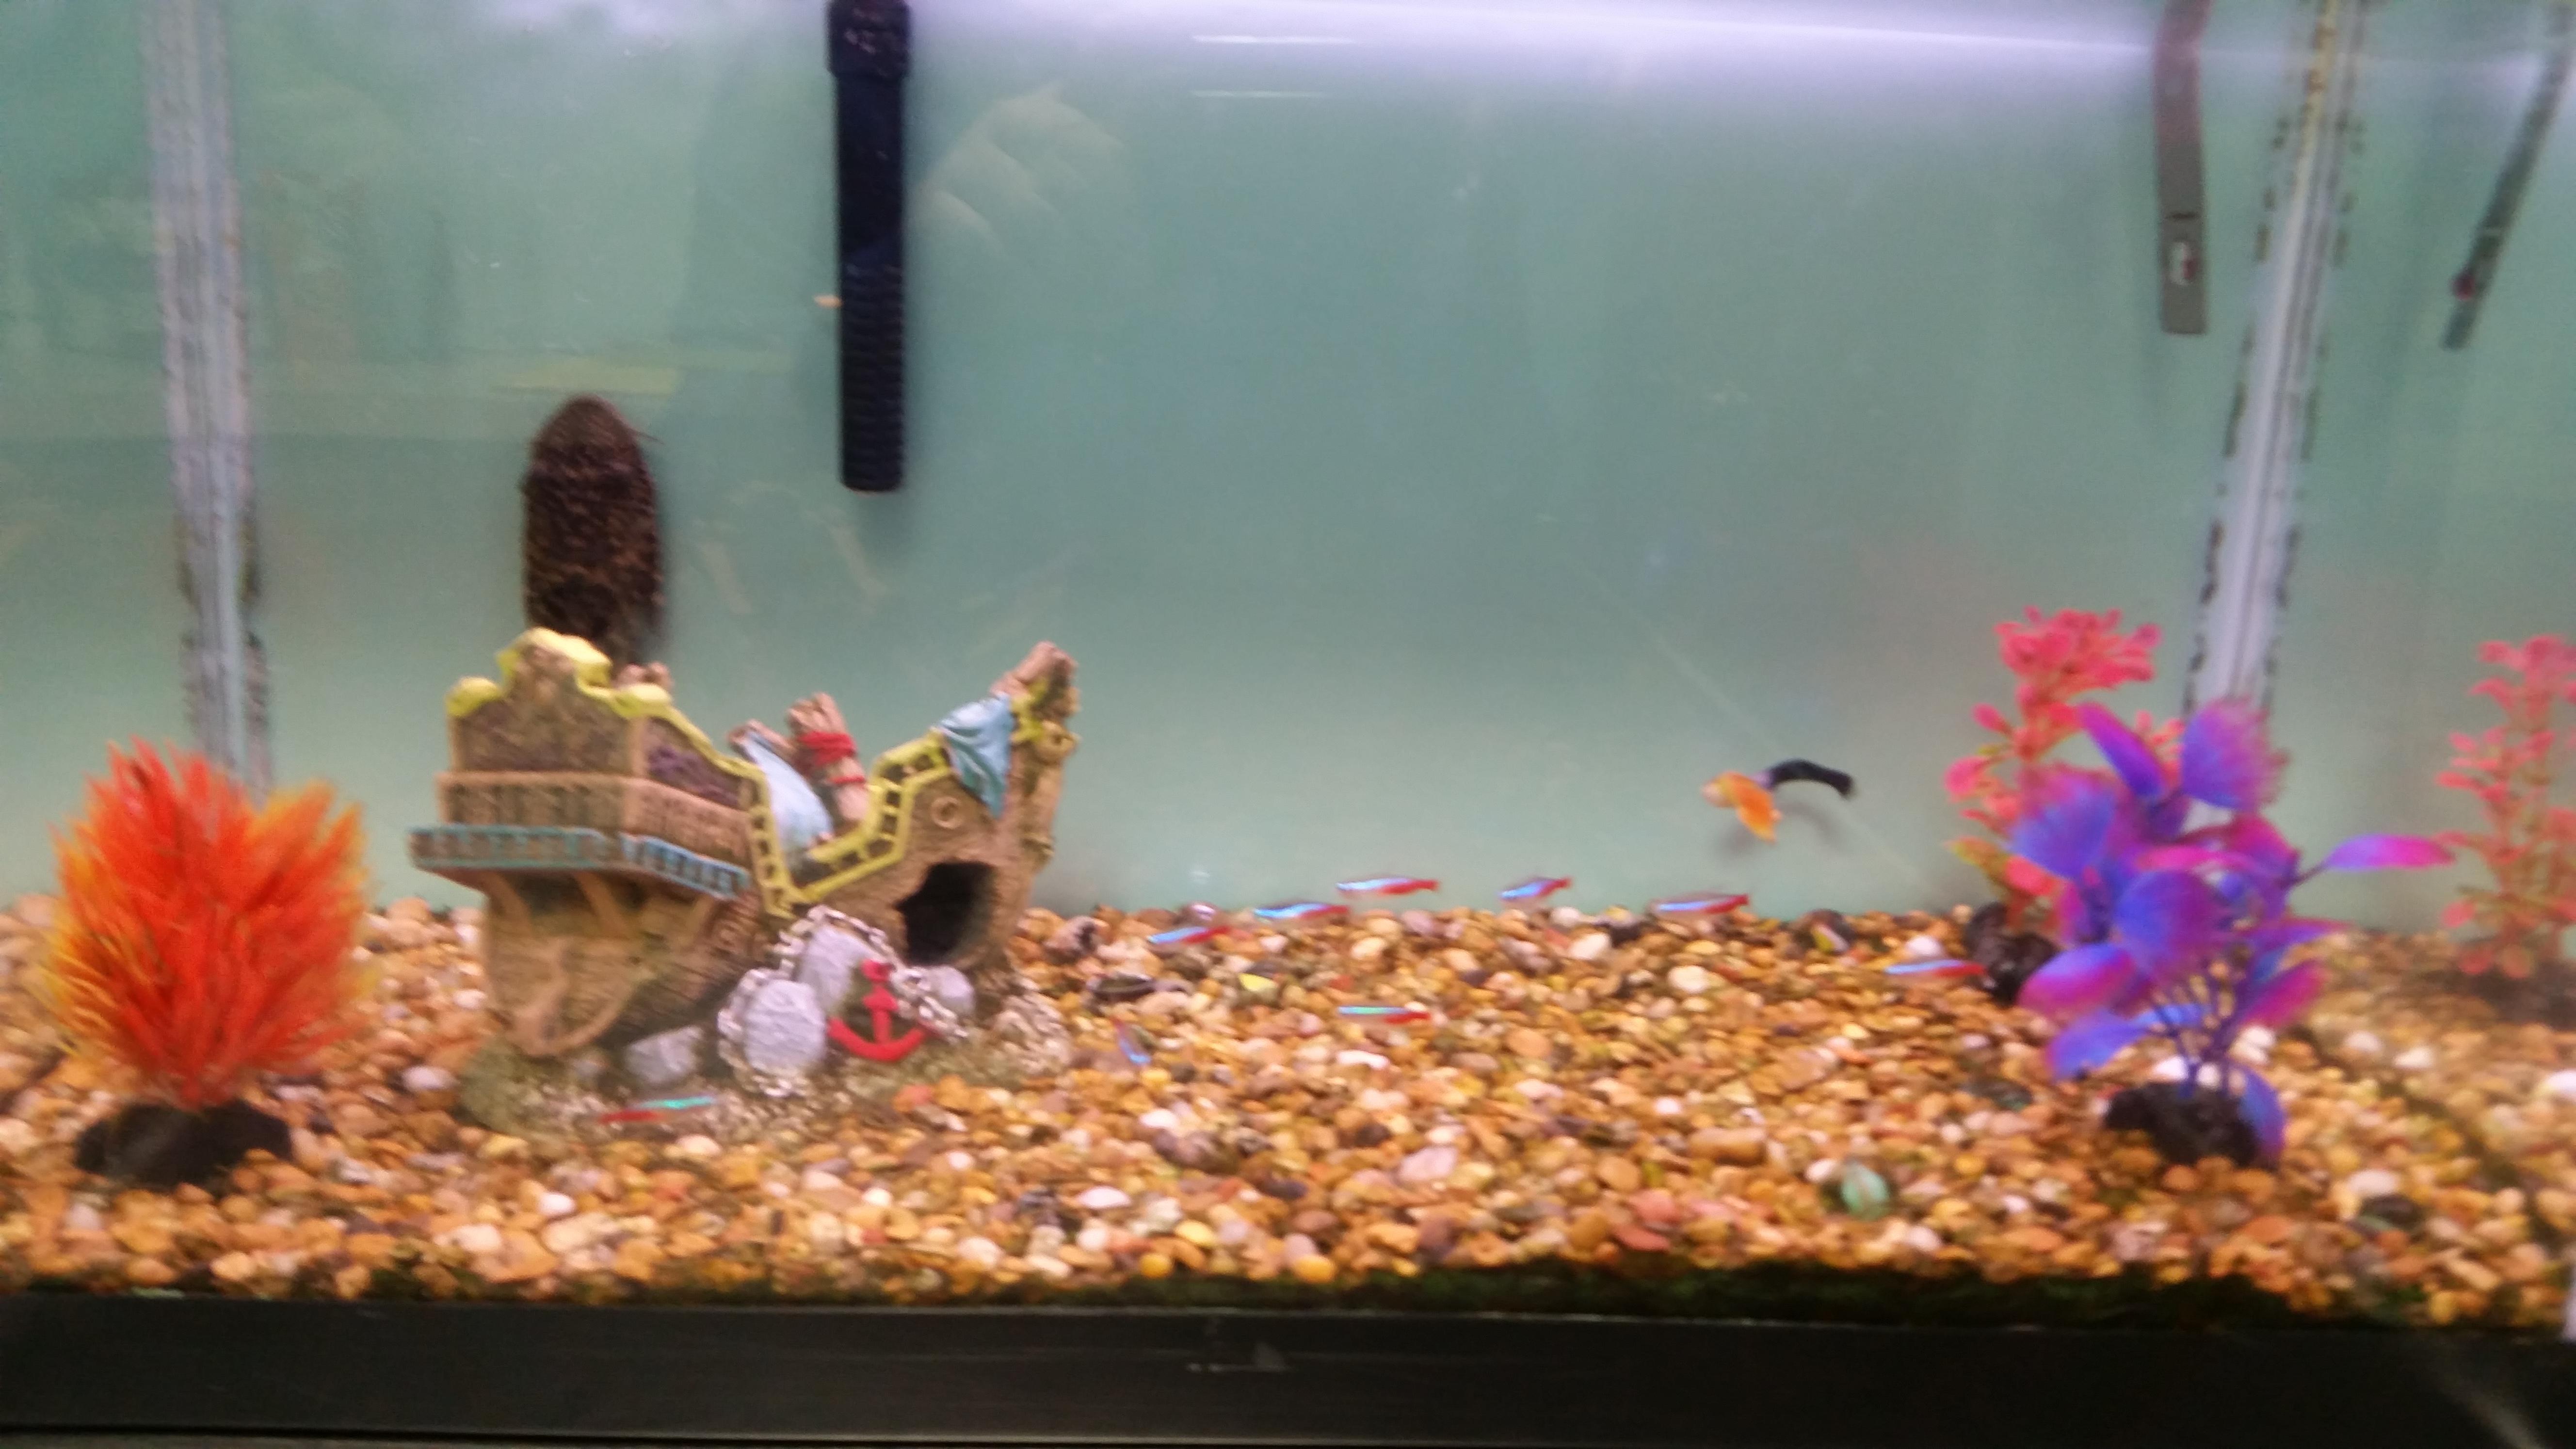 Fish Tank in Exam Room 4